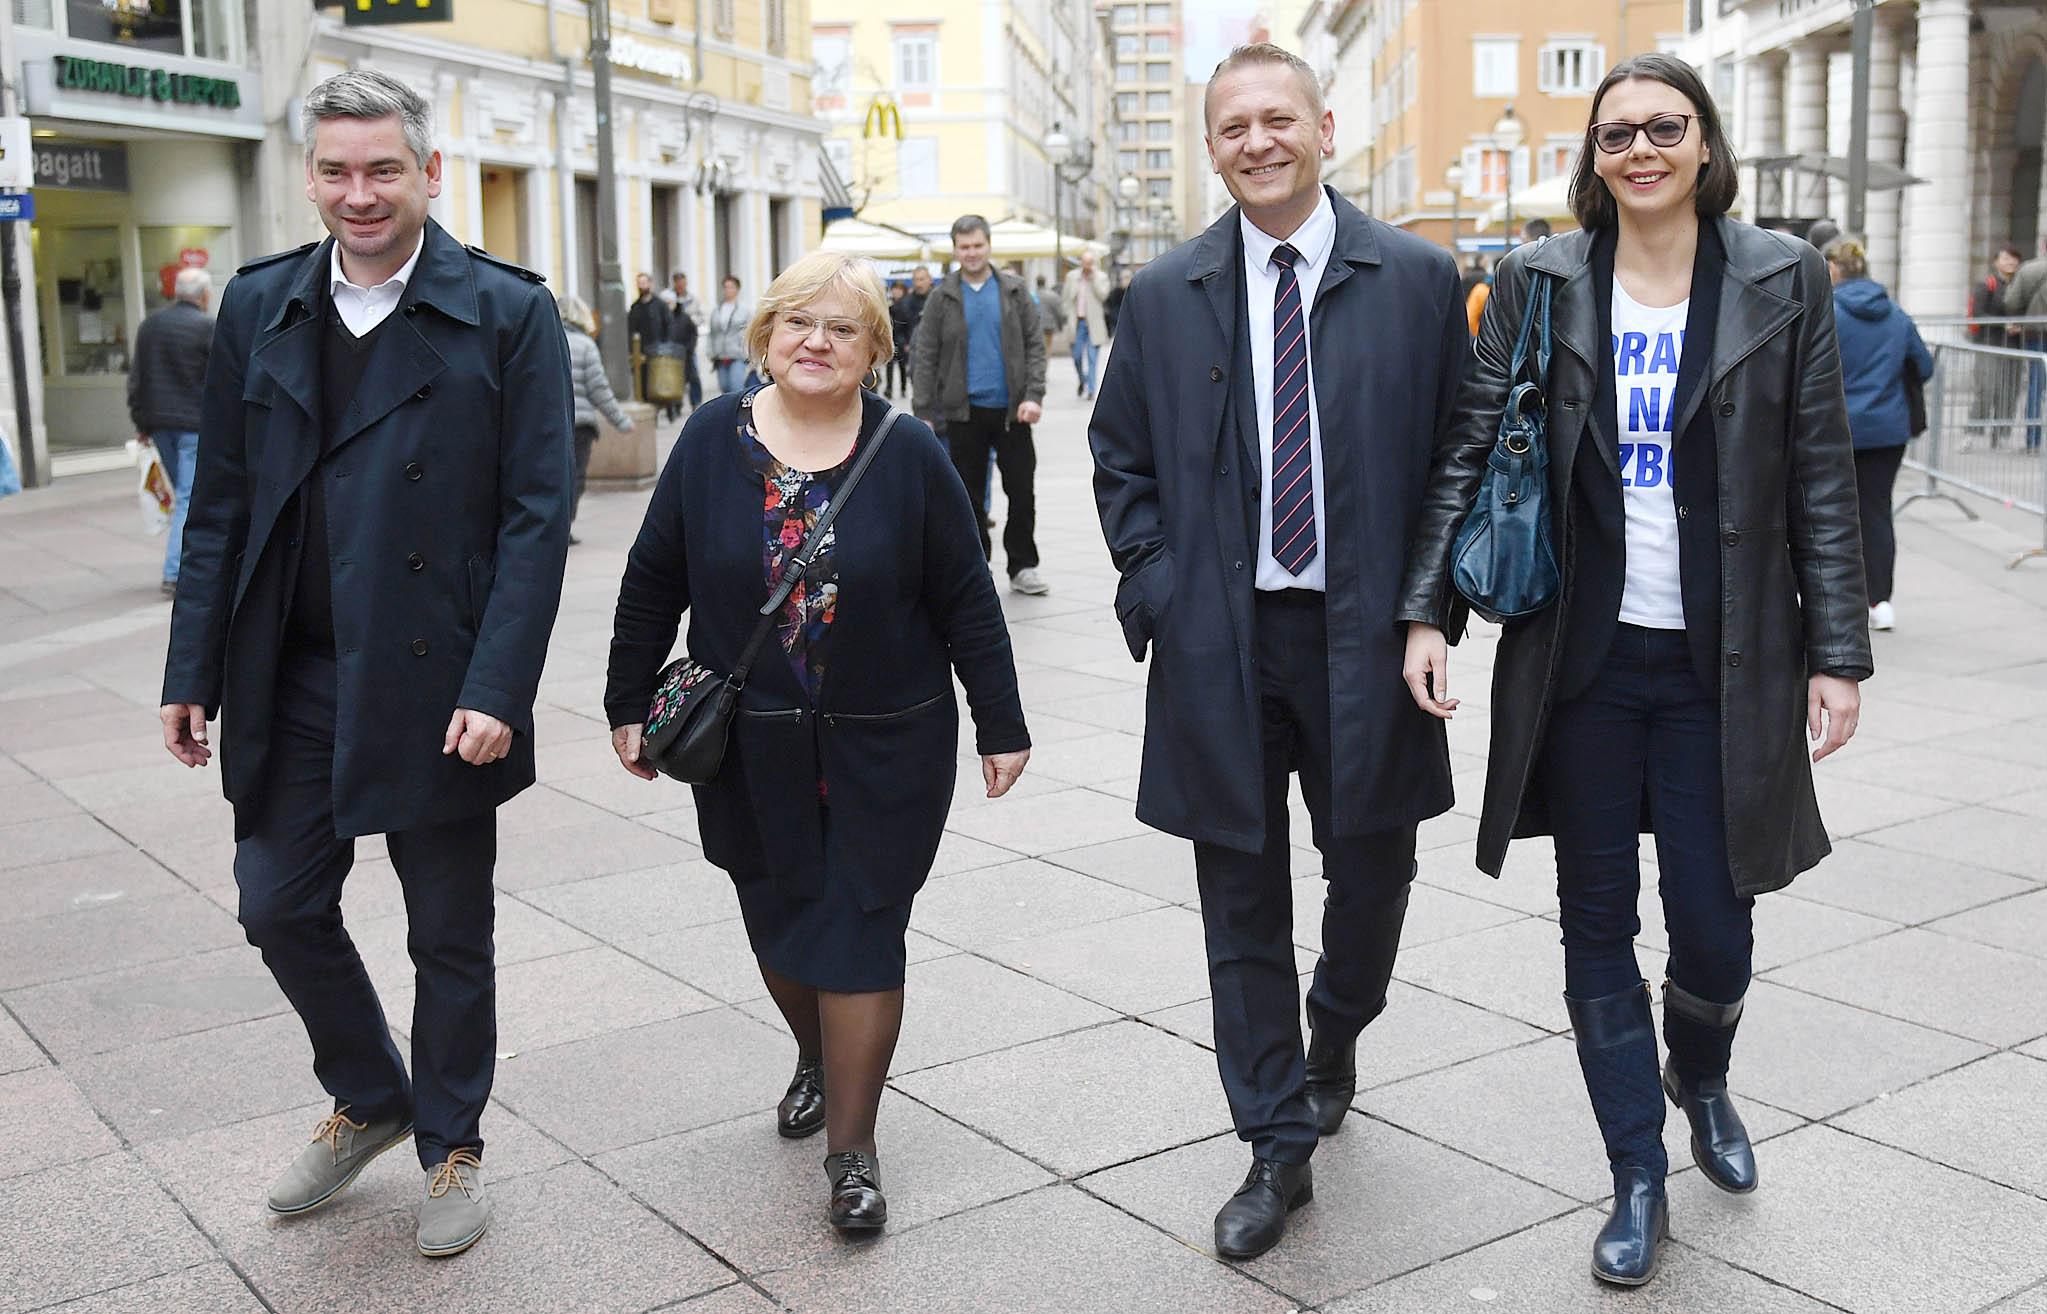 Amsterdamska koalicija, Boris Miletić, Anka Mrak Taritaš, Krešo Beljak i Tea Mičić, snimio Ivica TOMIĆ